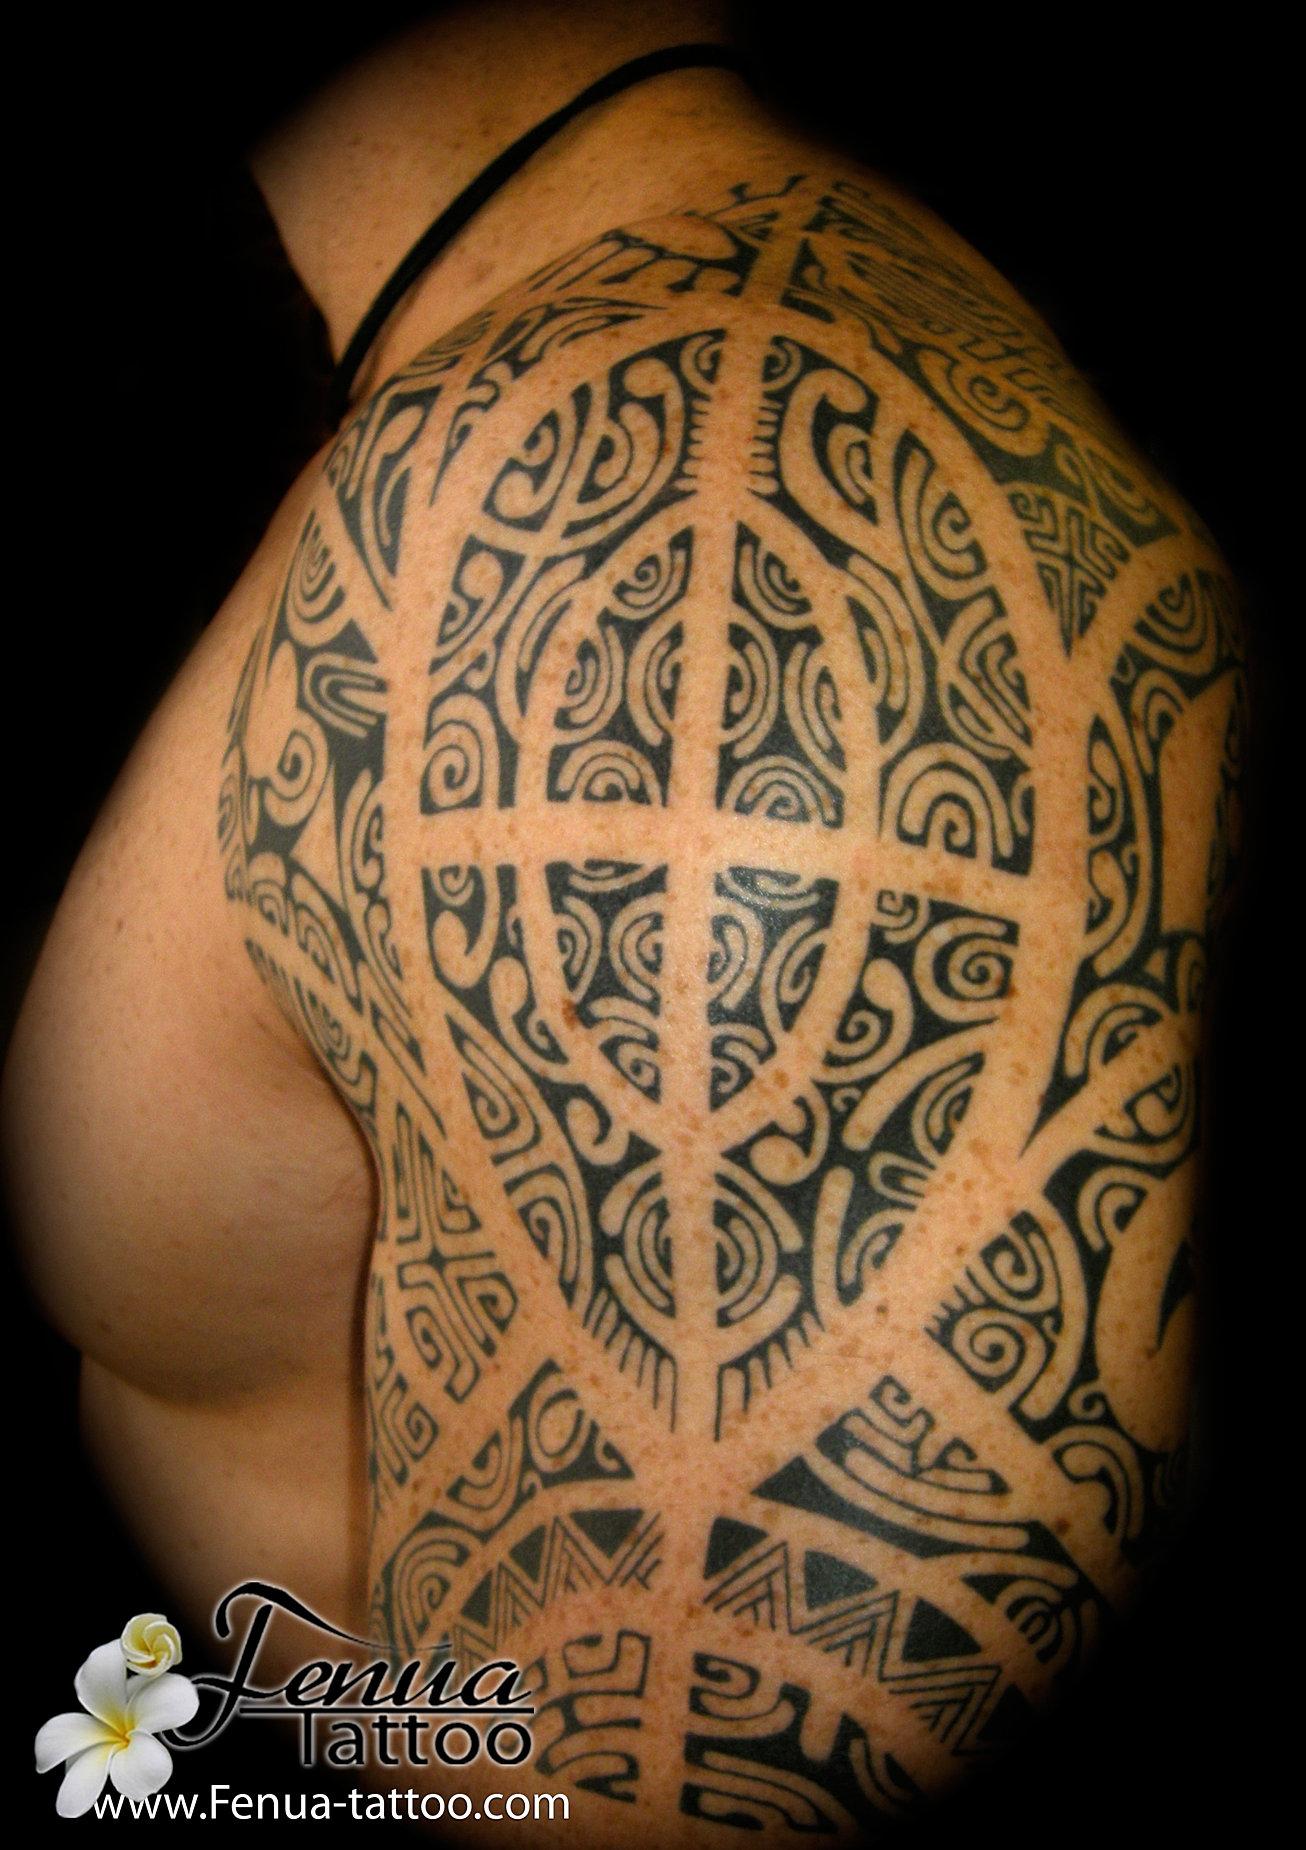 Tatouage polynesien by pierre martinez de tahiti tattoo sanary mer picasa polynesien et - Tatouage epaule bras ...